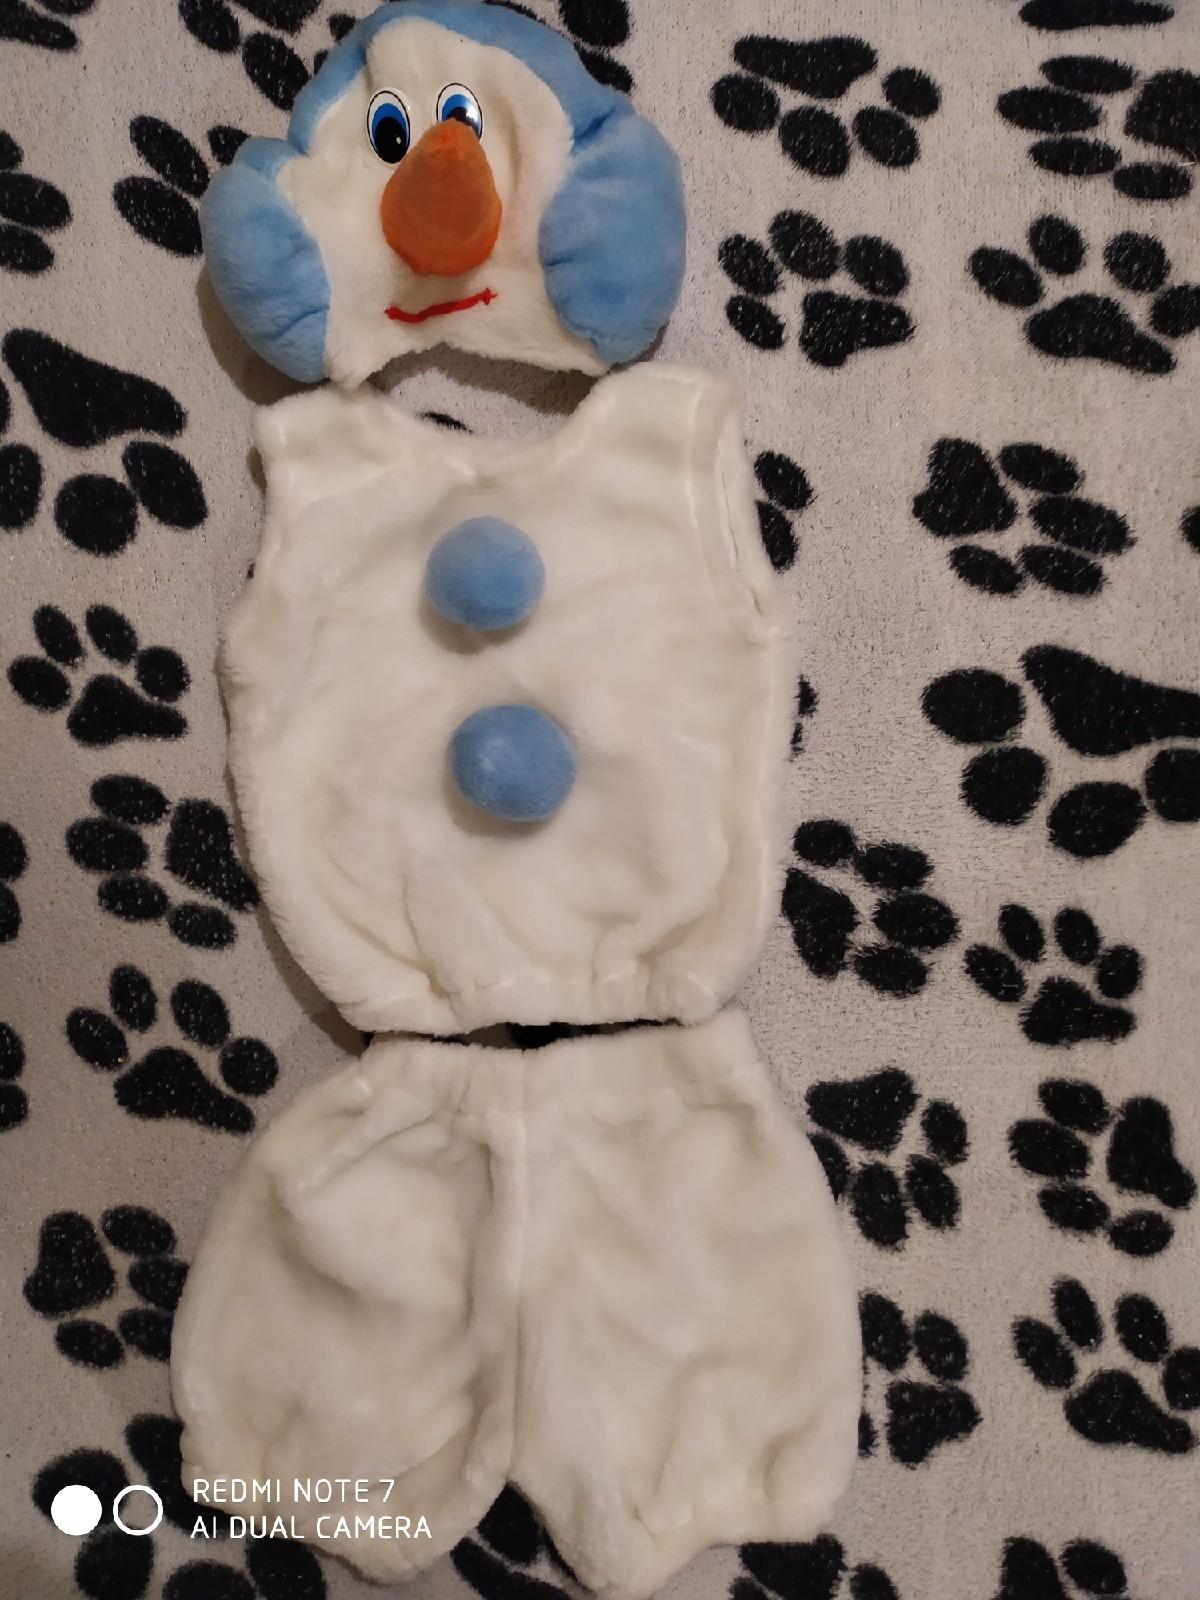 Продам костюм снеговика на возраст, примерно, 3-5 лет.